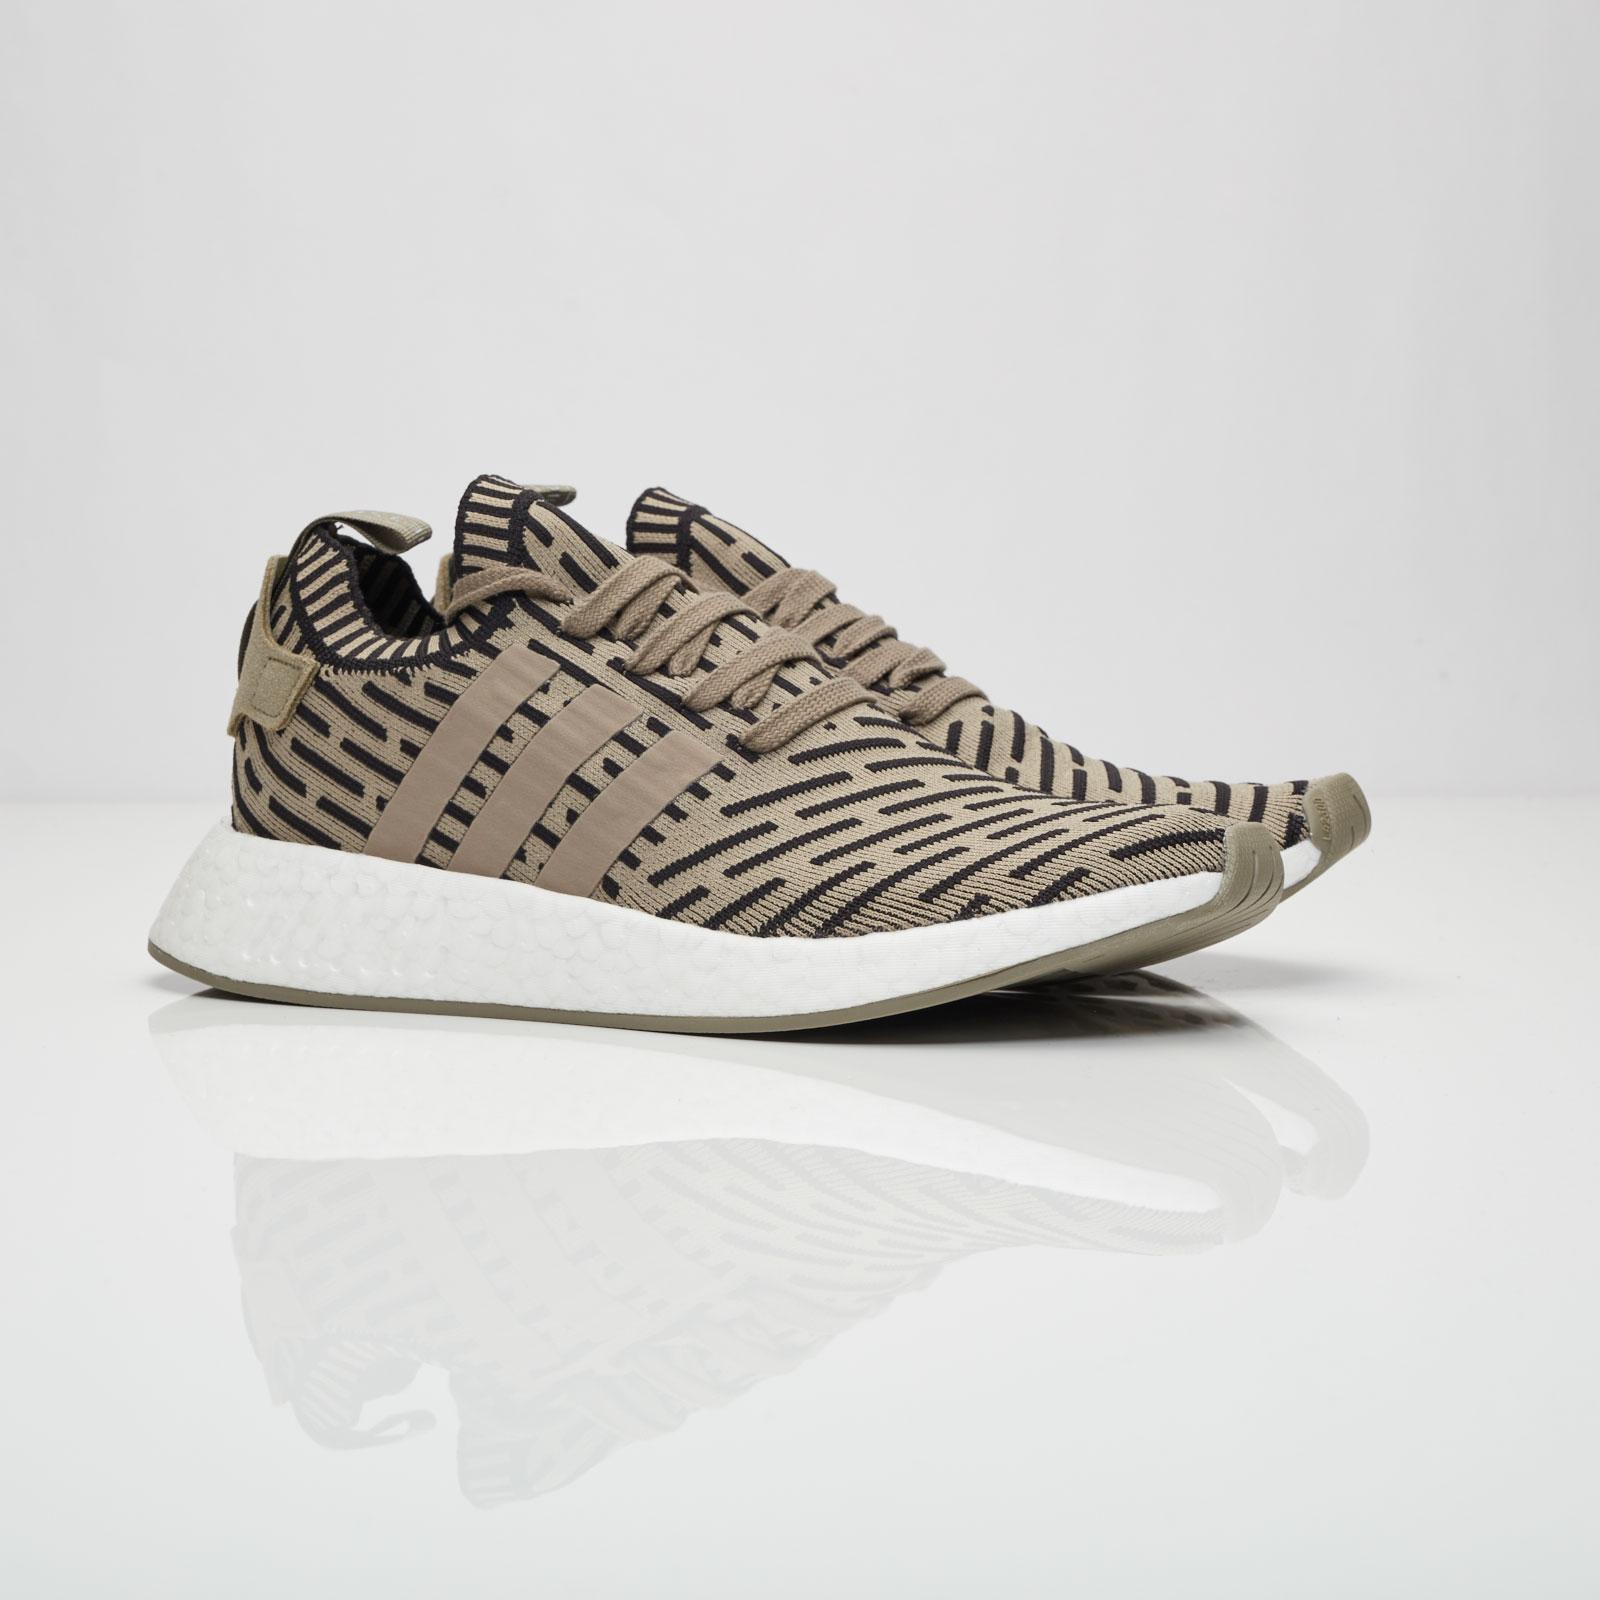 adidas nmd r2 pk ba7198 sneakersnstuff scarpe & streetwear